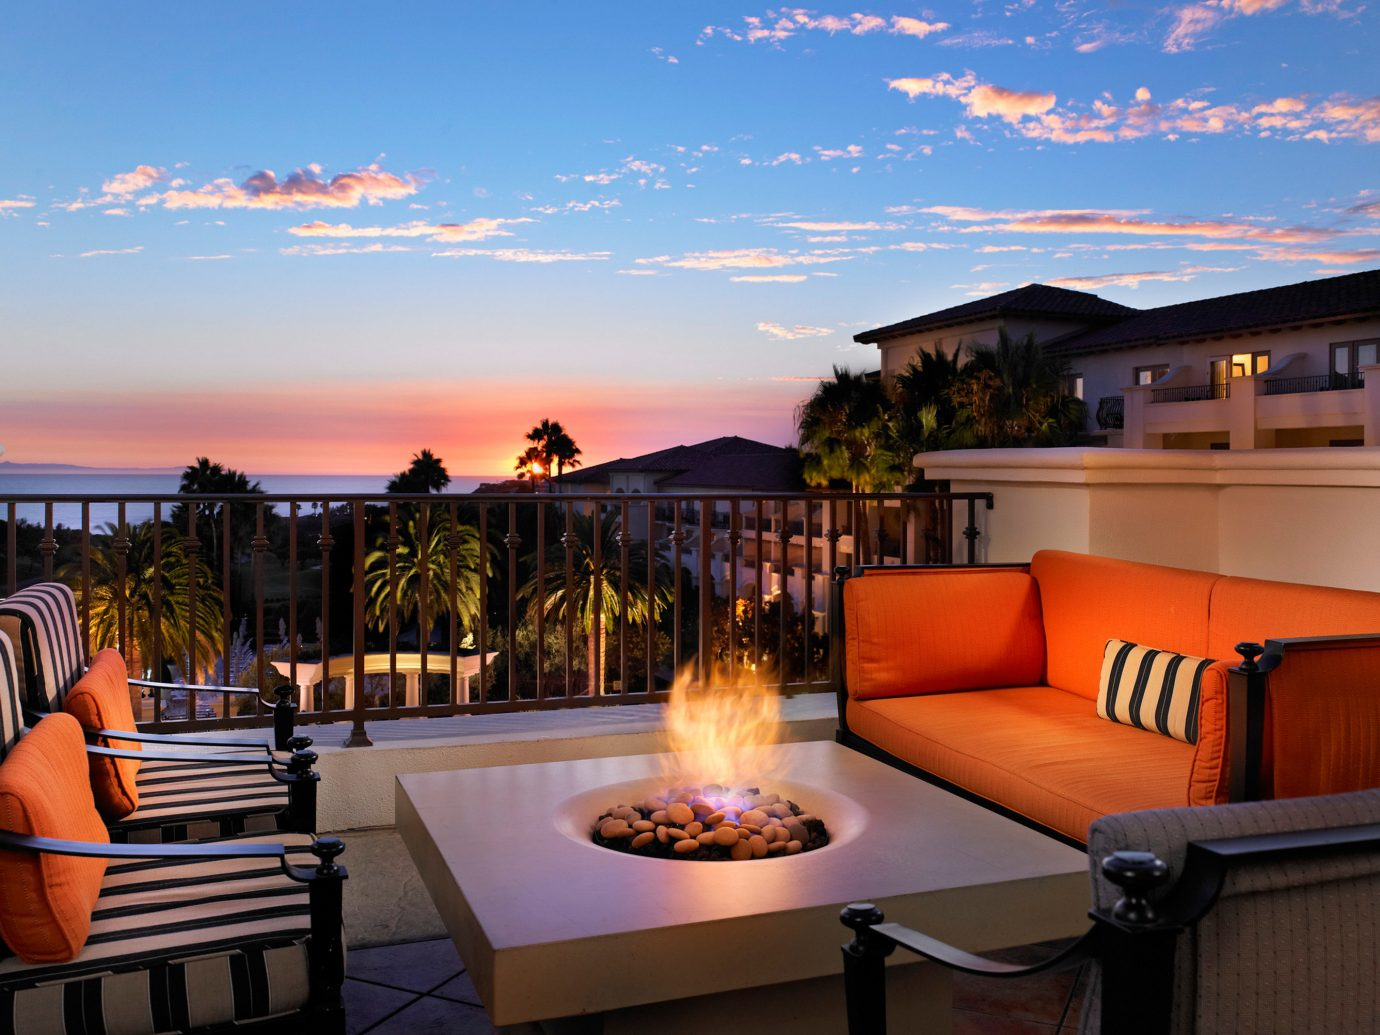 Hotels Living Lounge Luxury sky orange outdoor property estate house vacation home Resort Sunset real estate Villa setting set